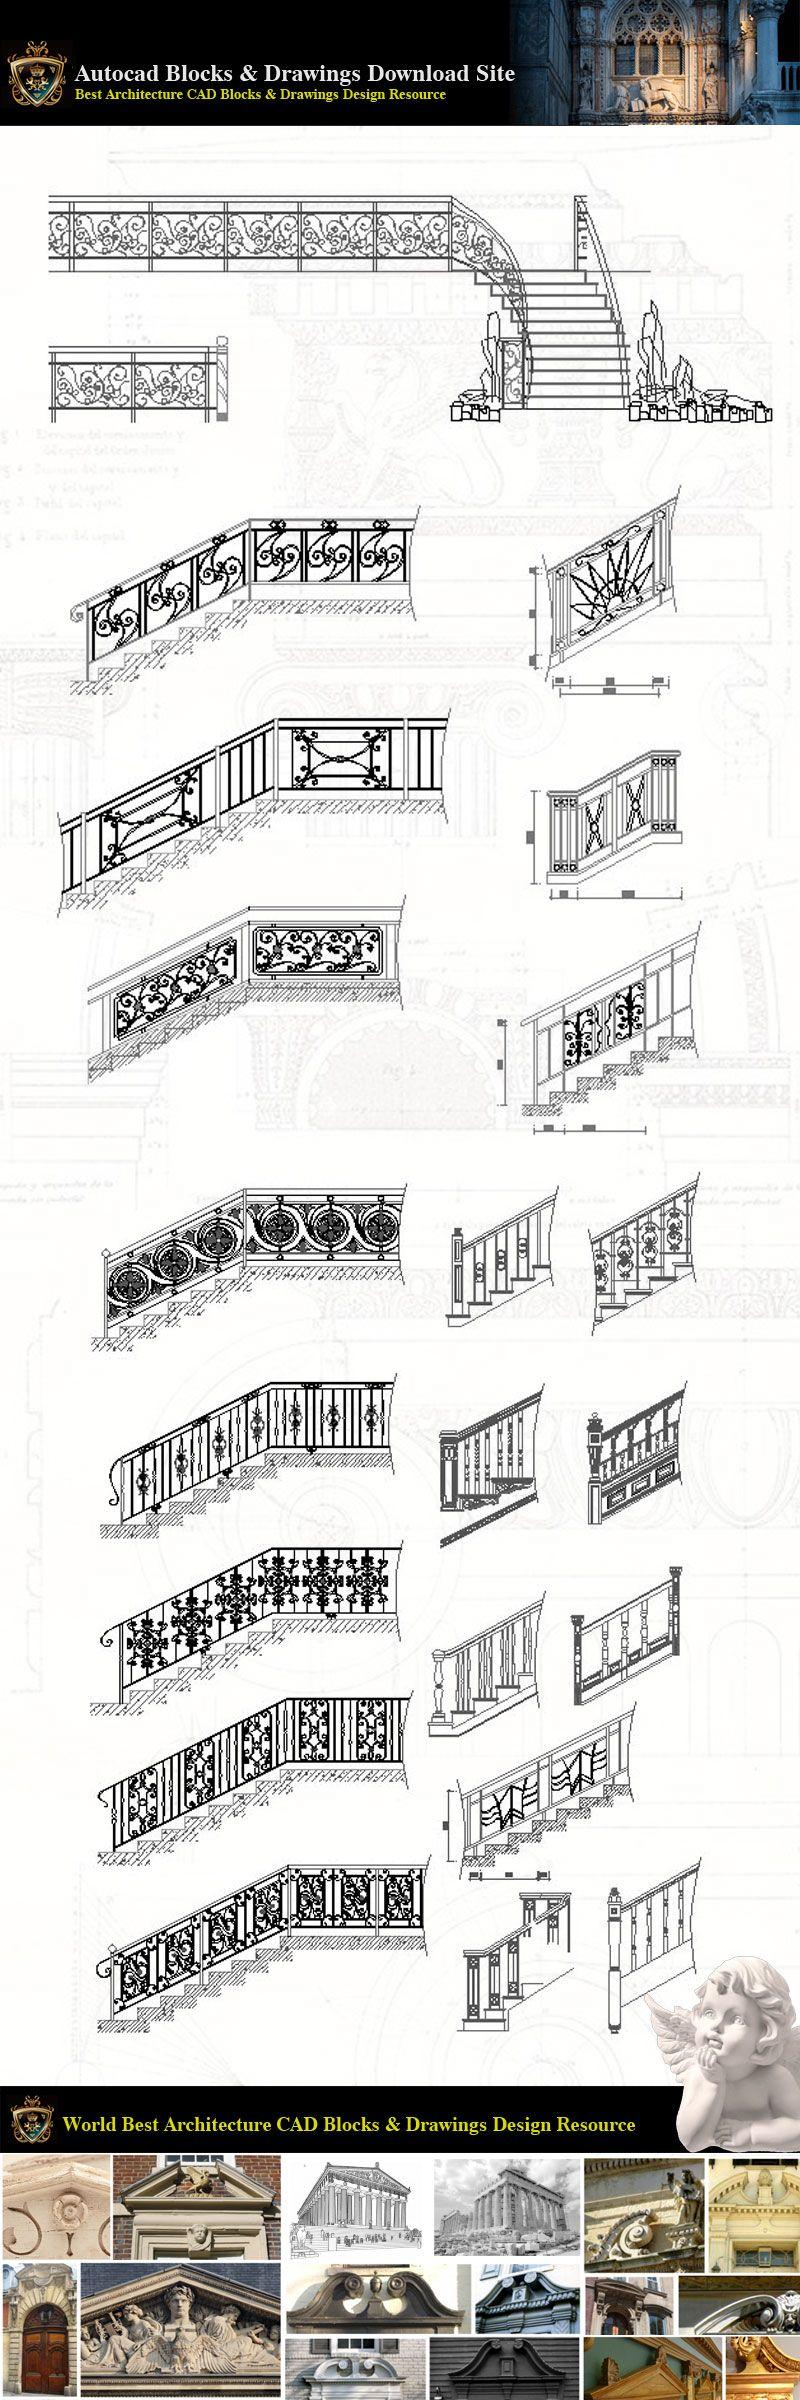 Pin By Luis Flck On Zeichnen Architectural Decoration Interior Design Drawings Architecture